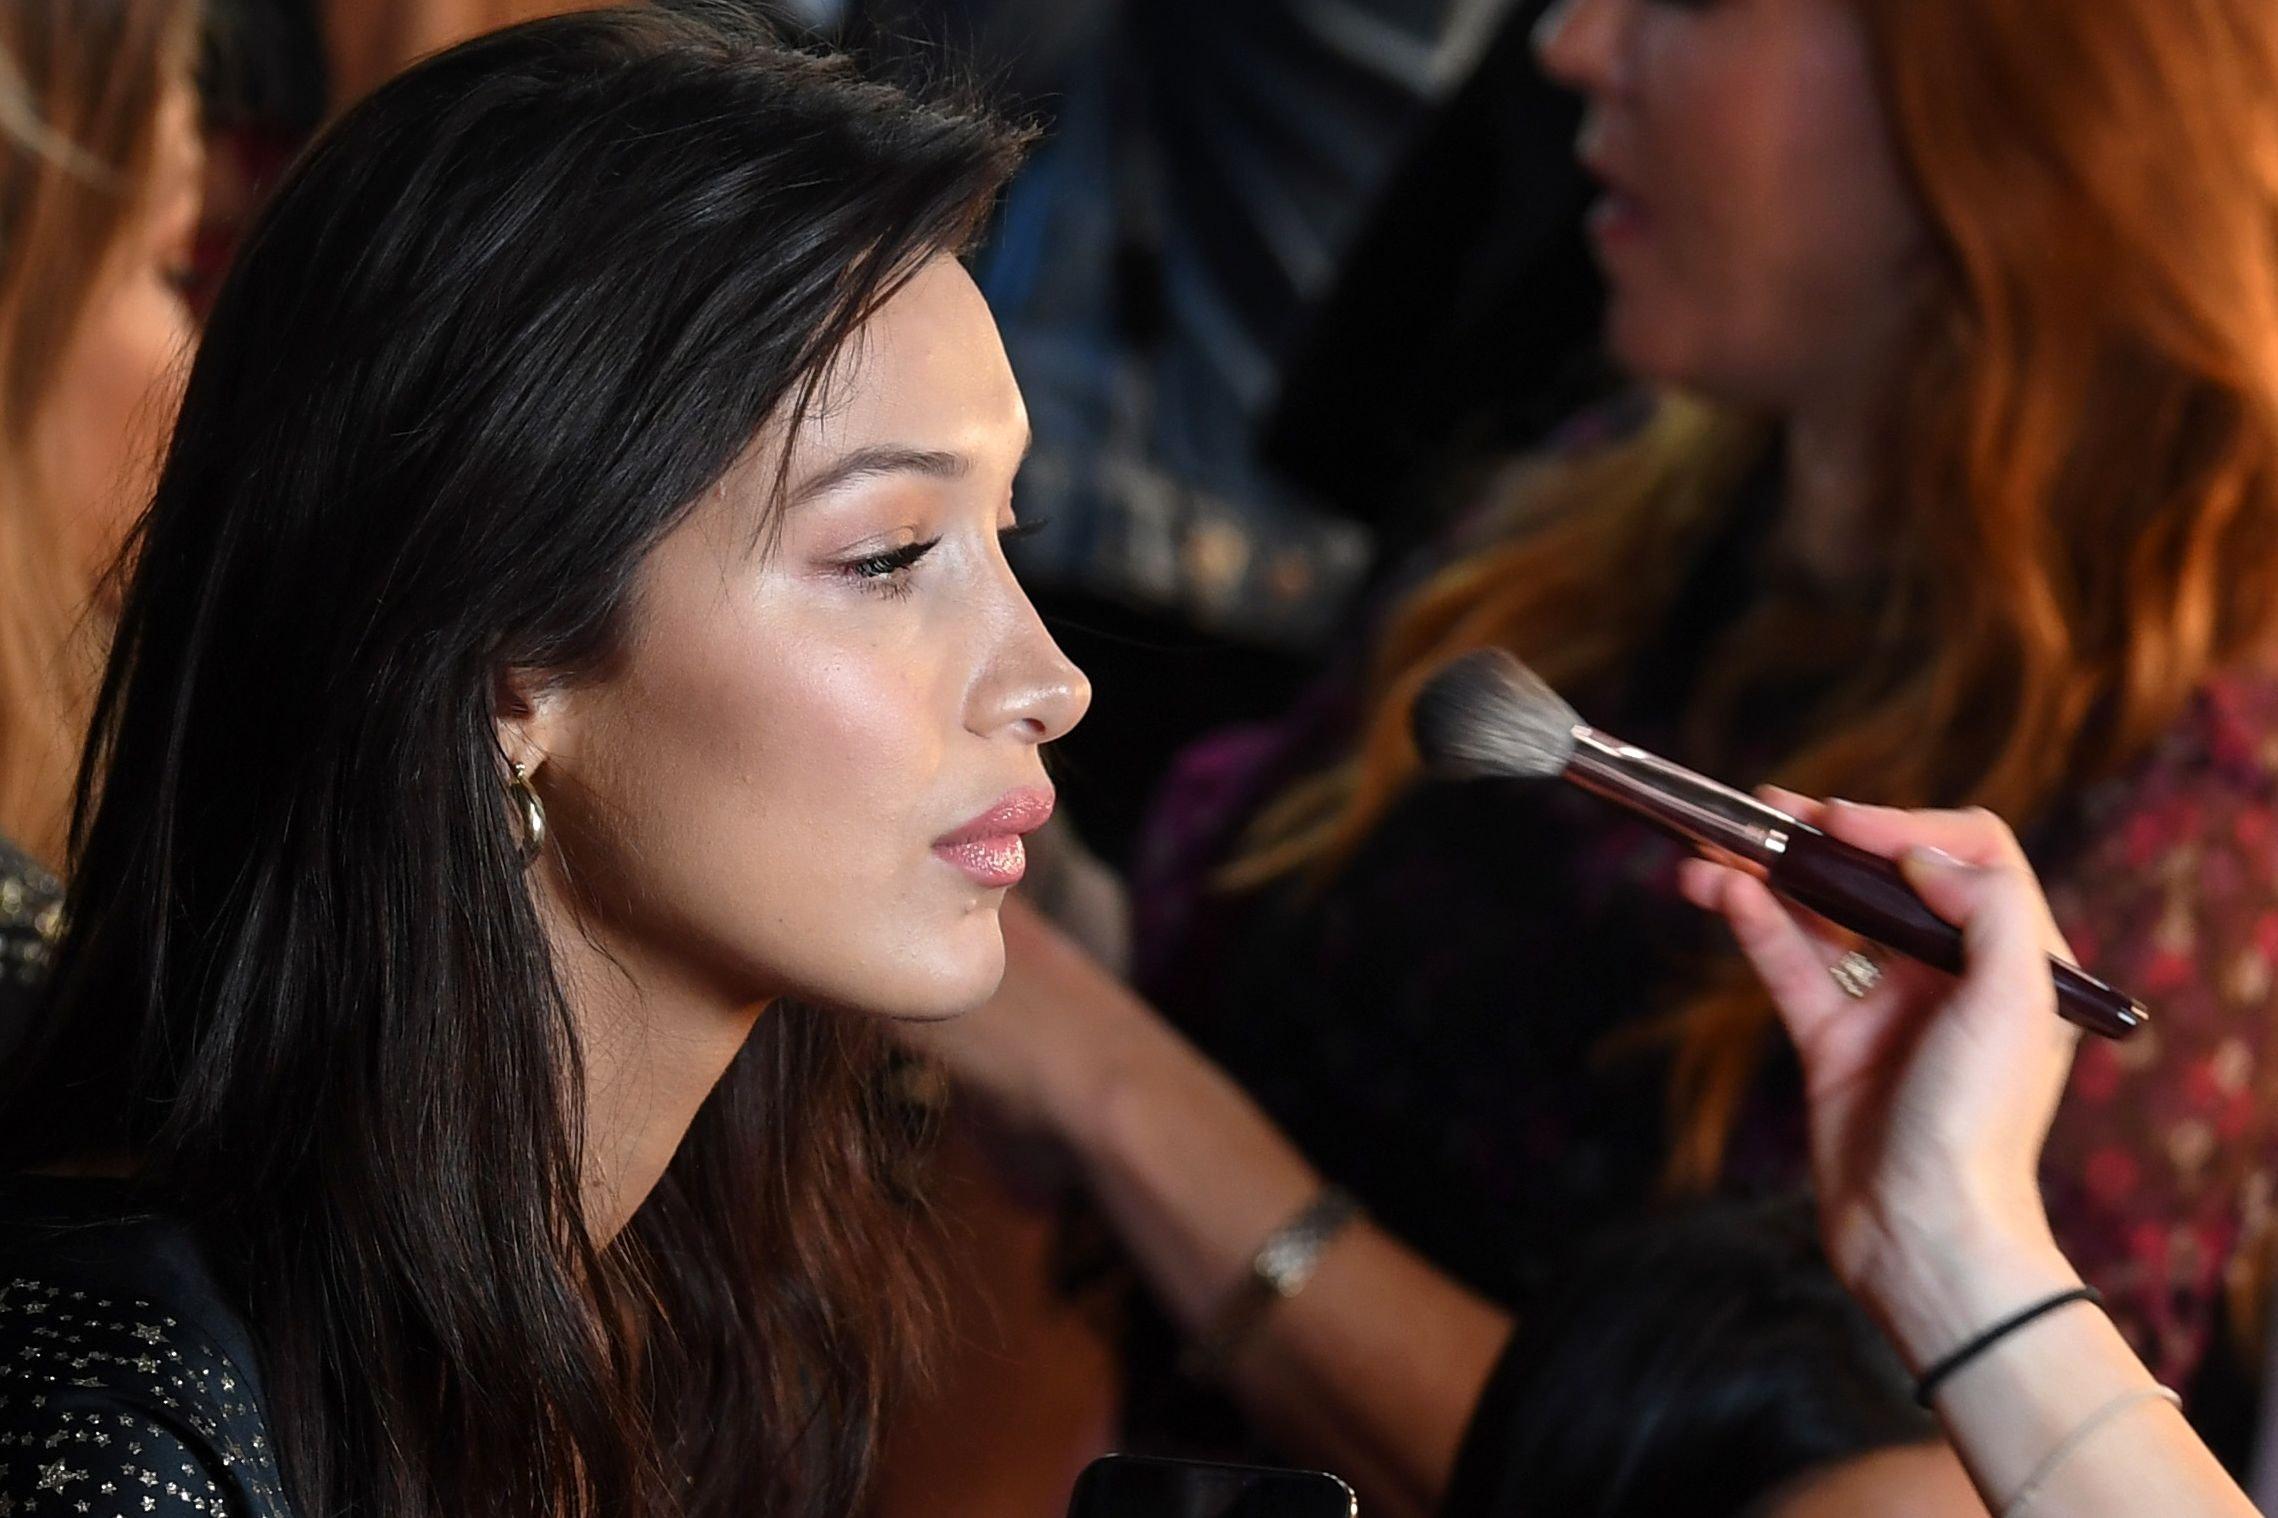 ea0a1688160a7 8 Victoria's Secret Fashion Show 2018 Makeup Products You Can Buy ...